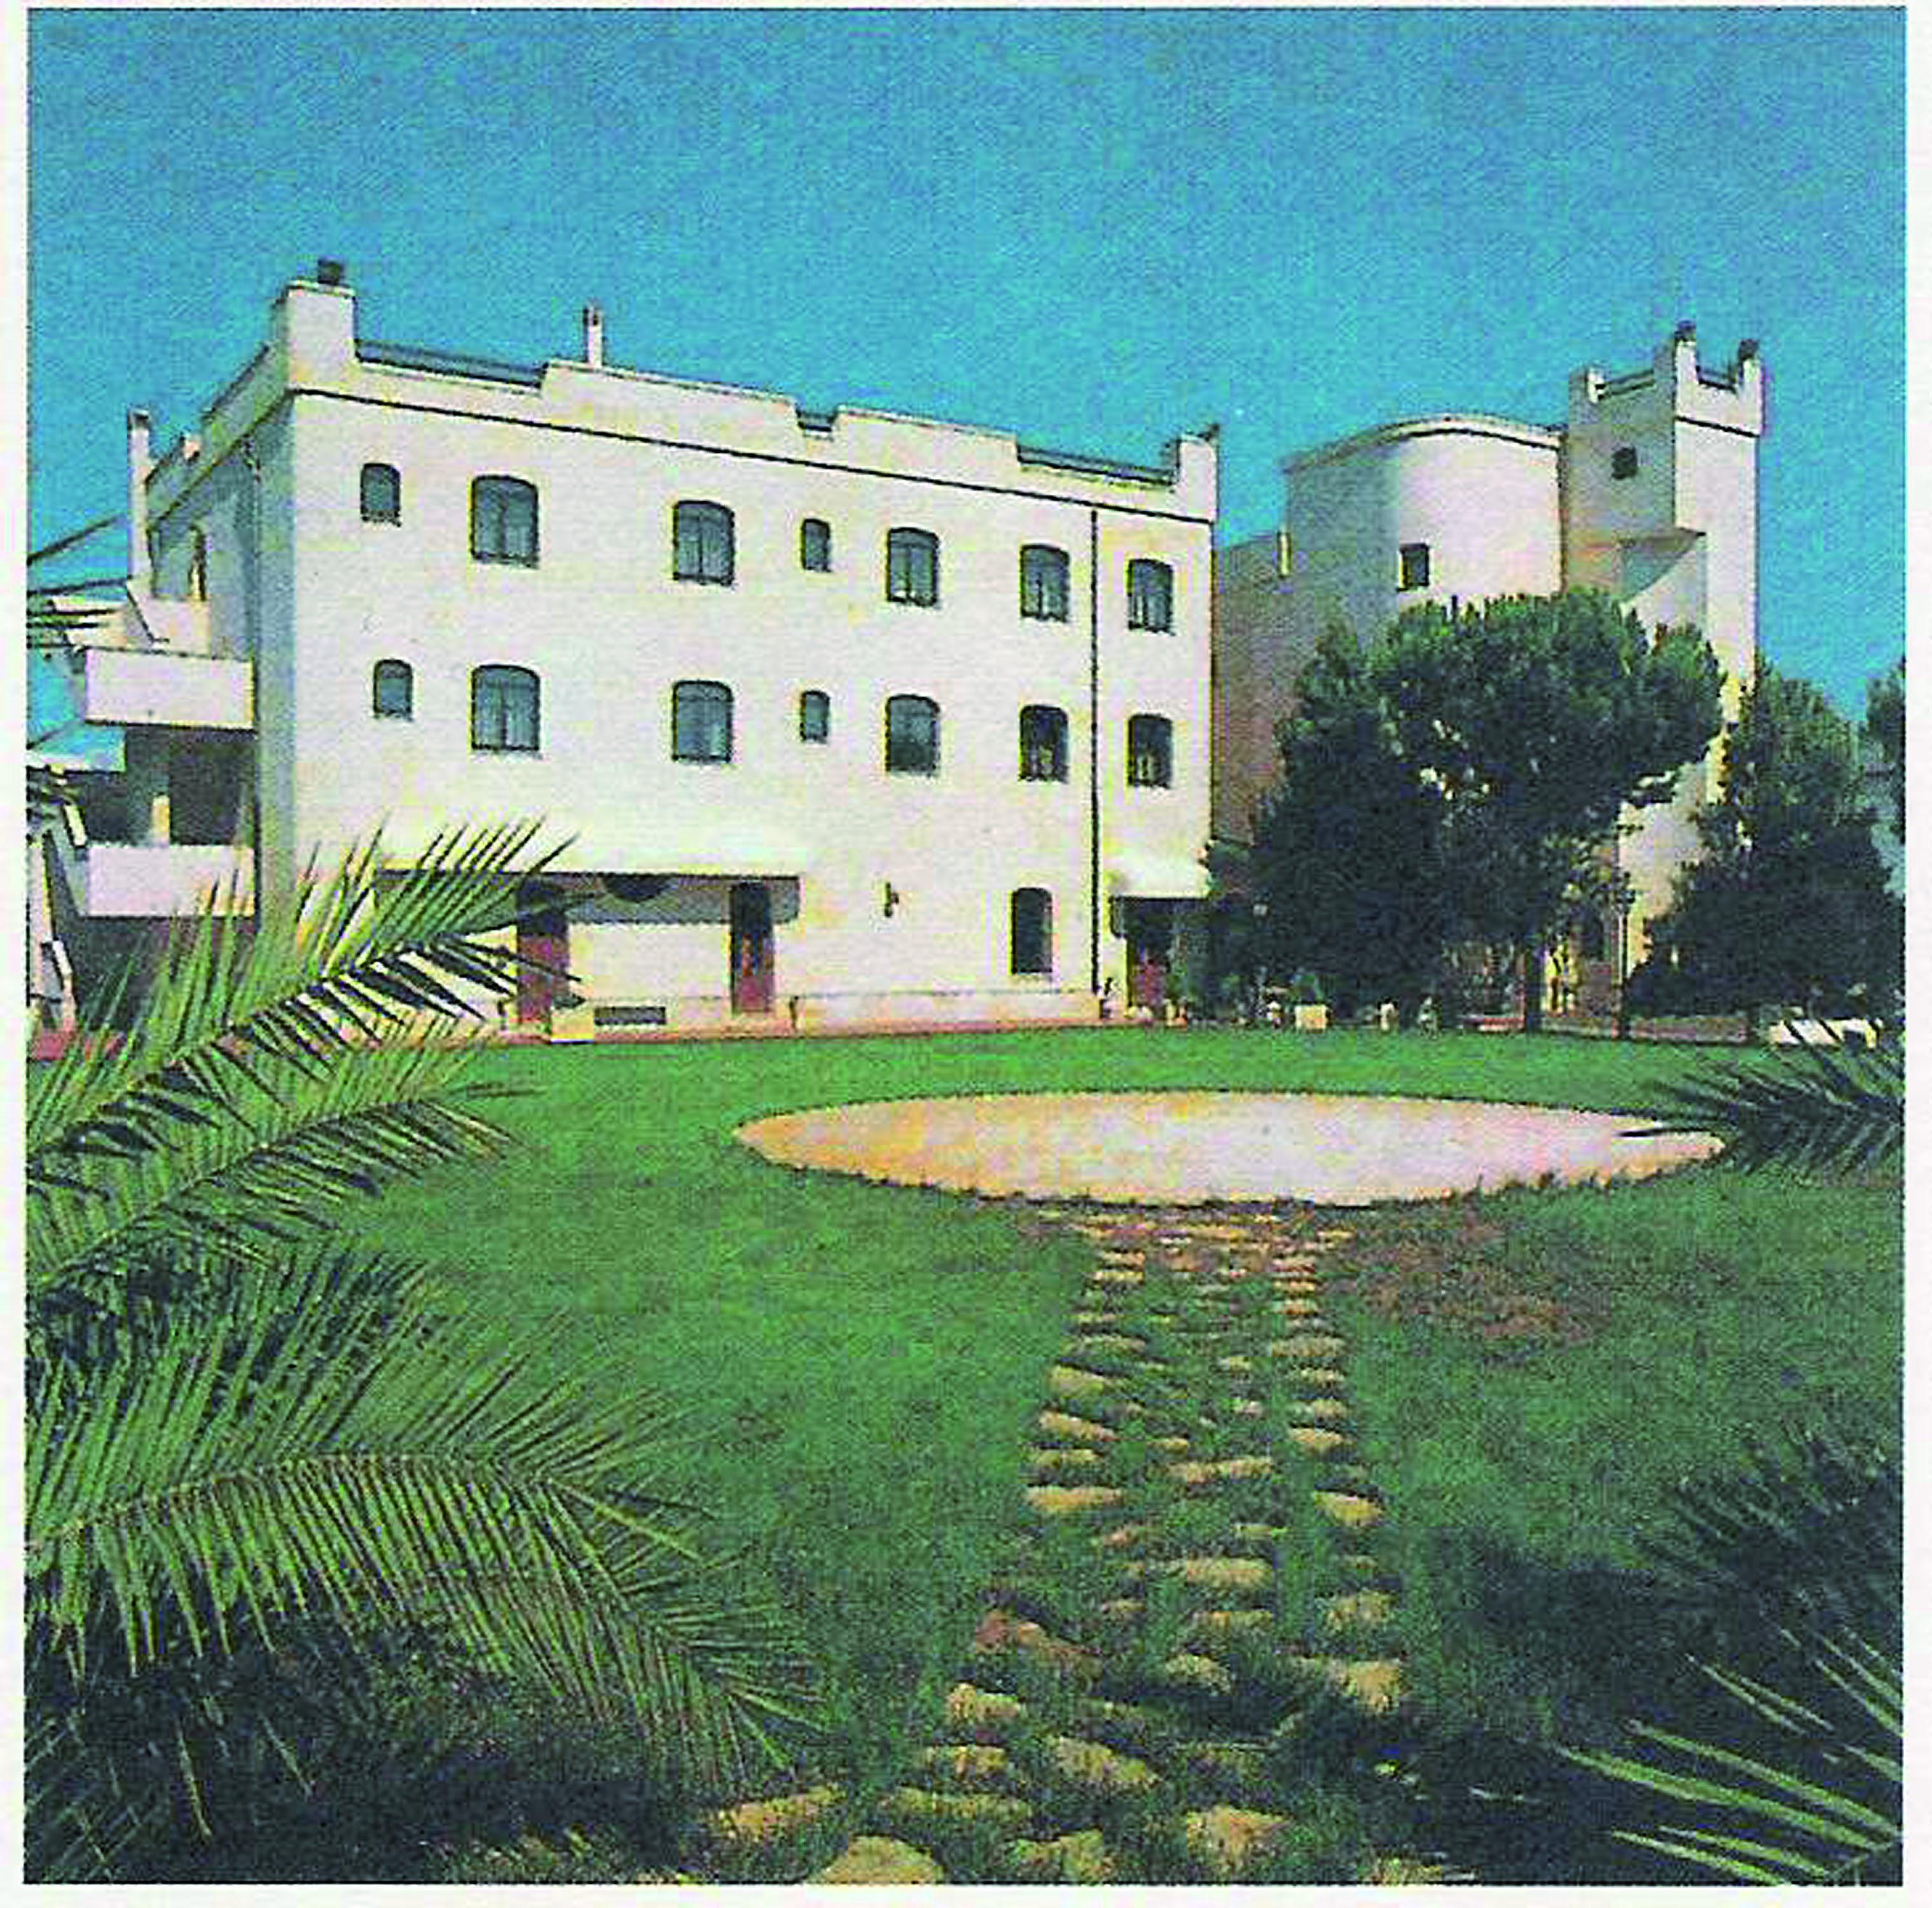 leone-de-castris-hotel-villa-donna-lisa